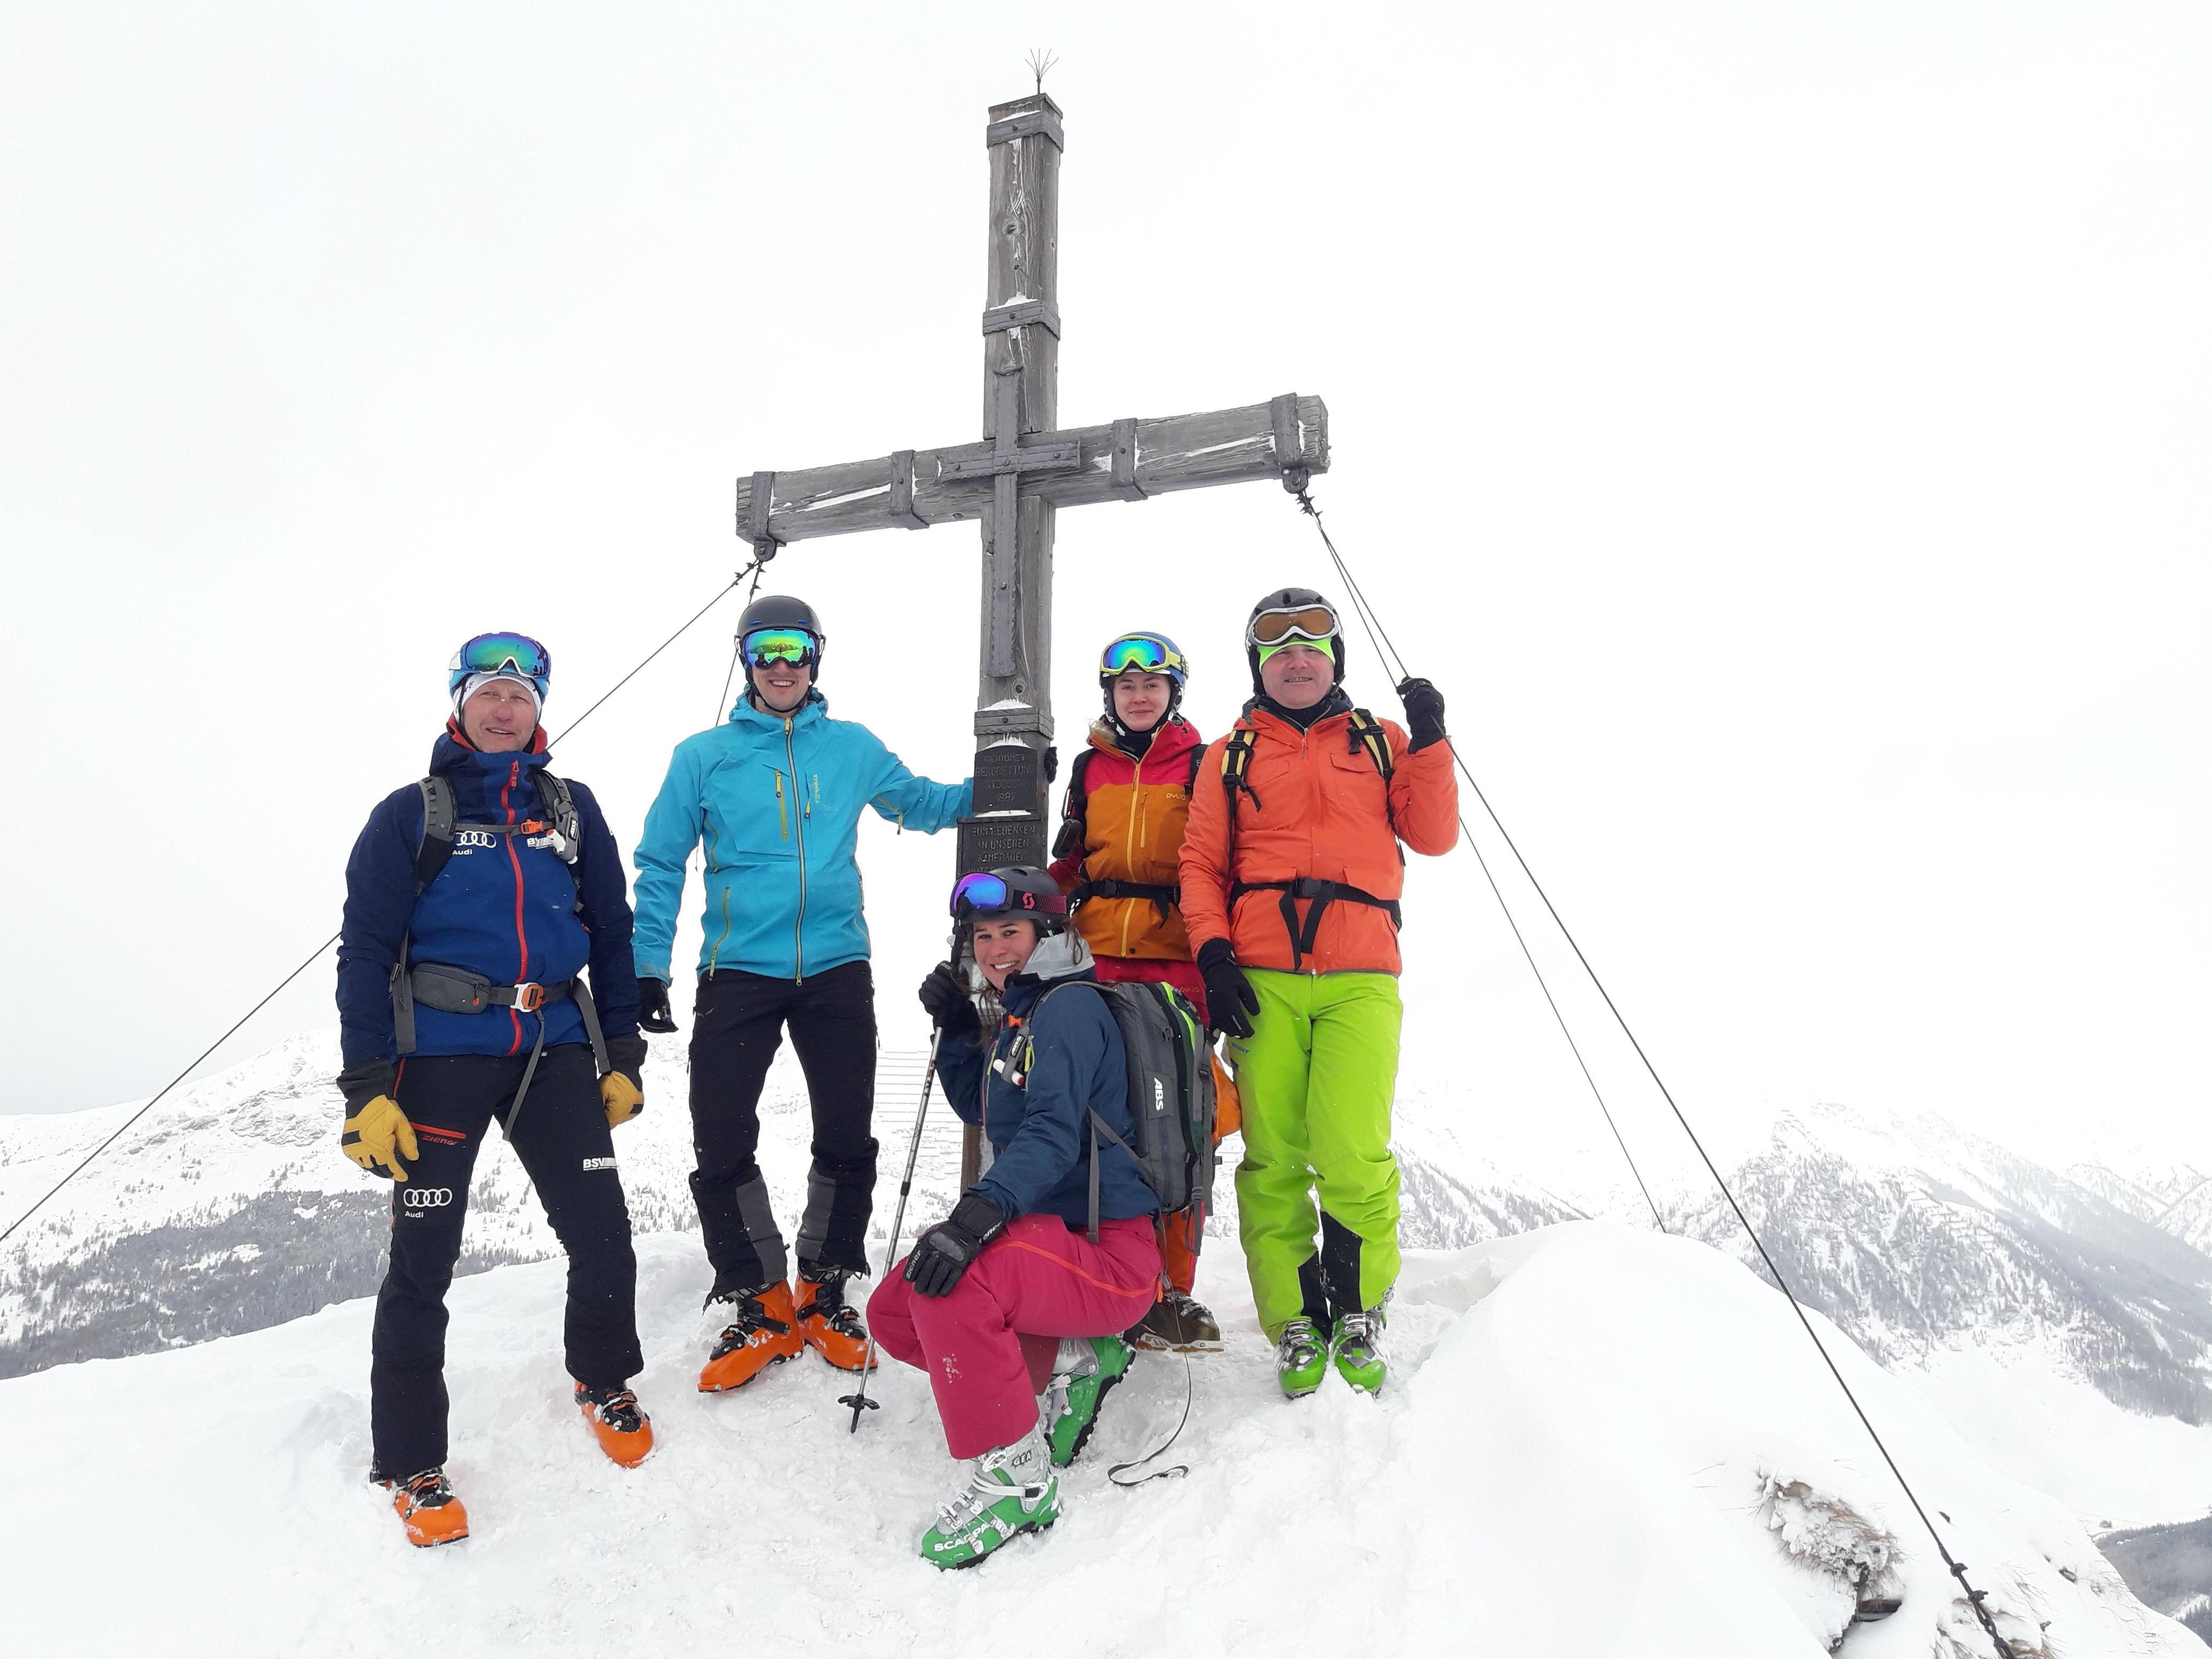 Lehrgang Instruktor Skitour in Sankt Jodok am Brenner